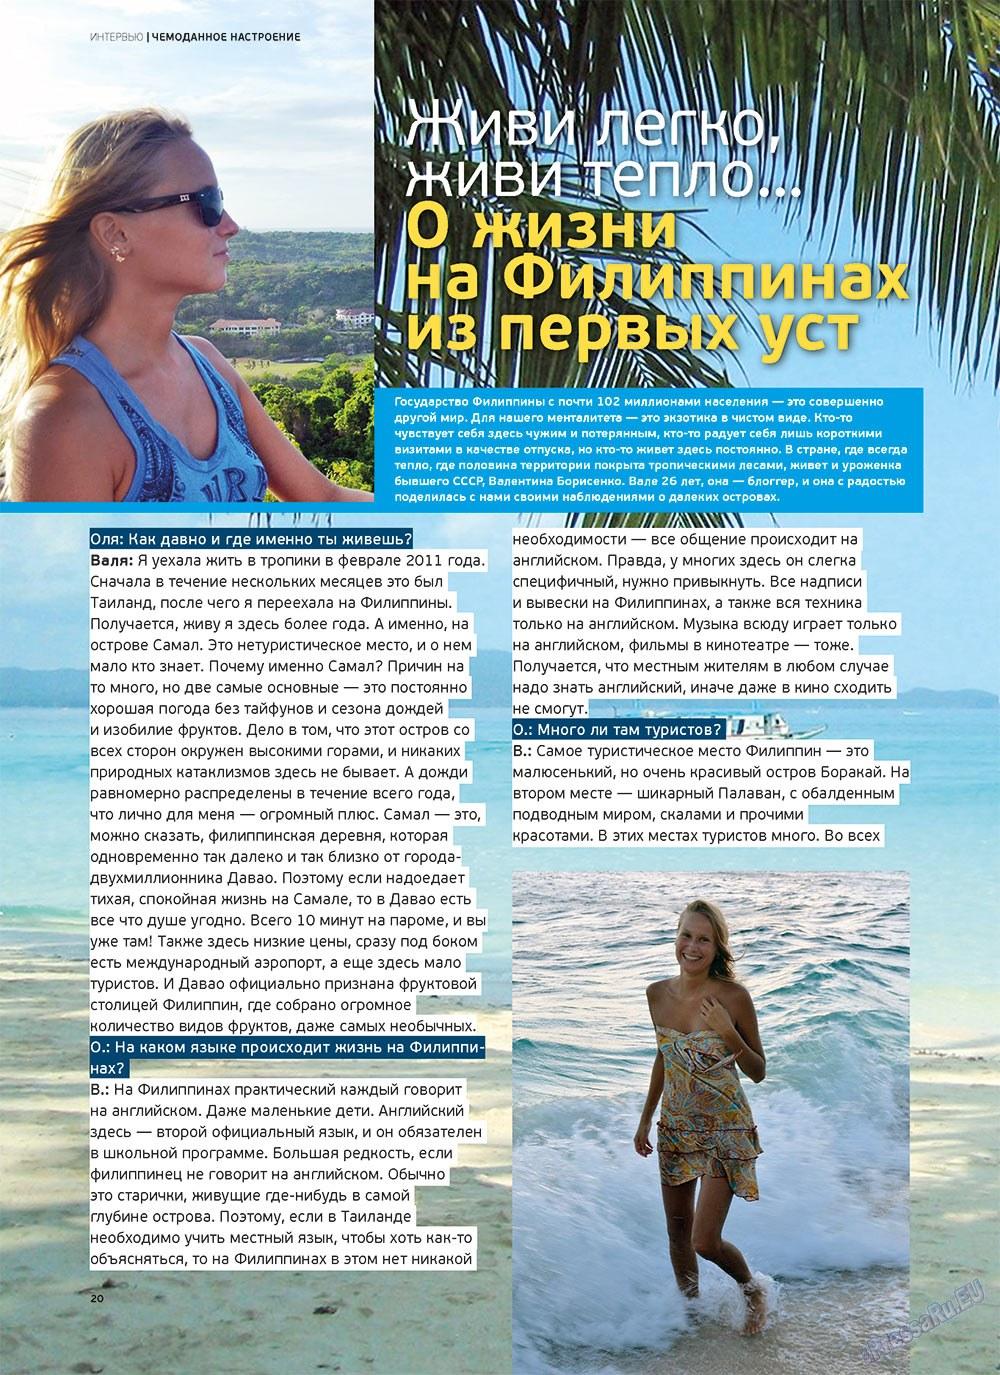 Артек (журнал). 2012 год, номер 5, стр. 22